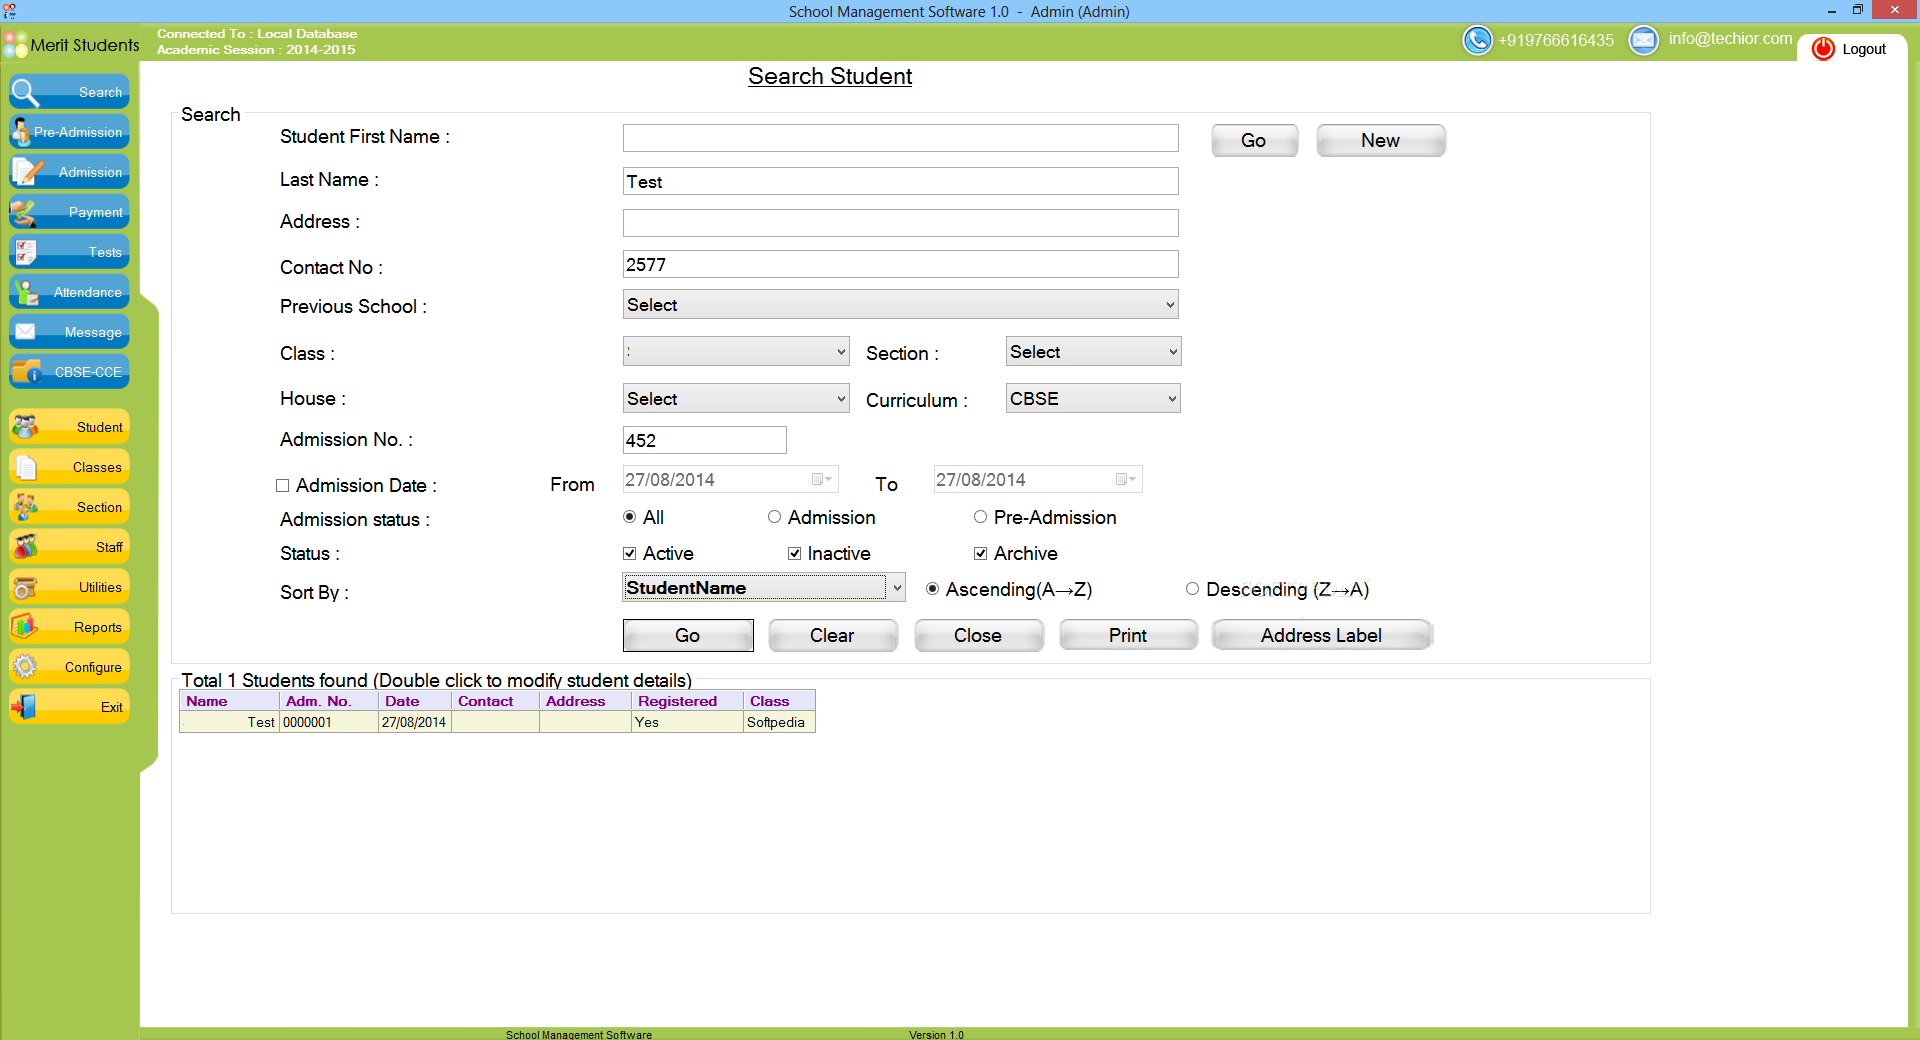 School Management Software 3.1